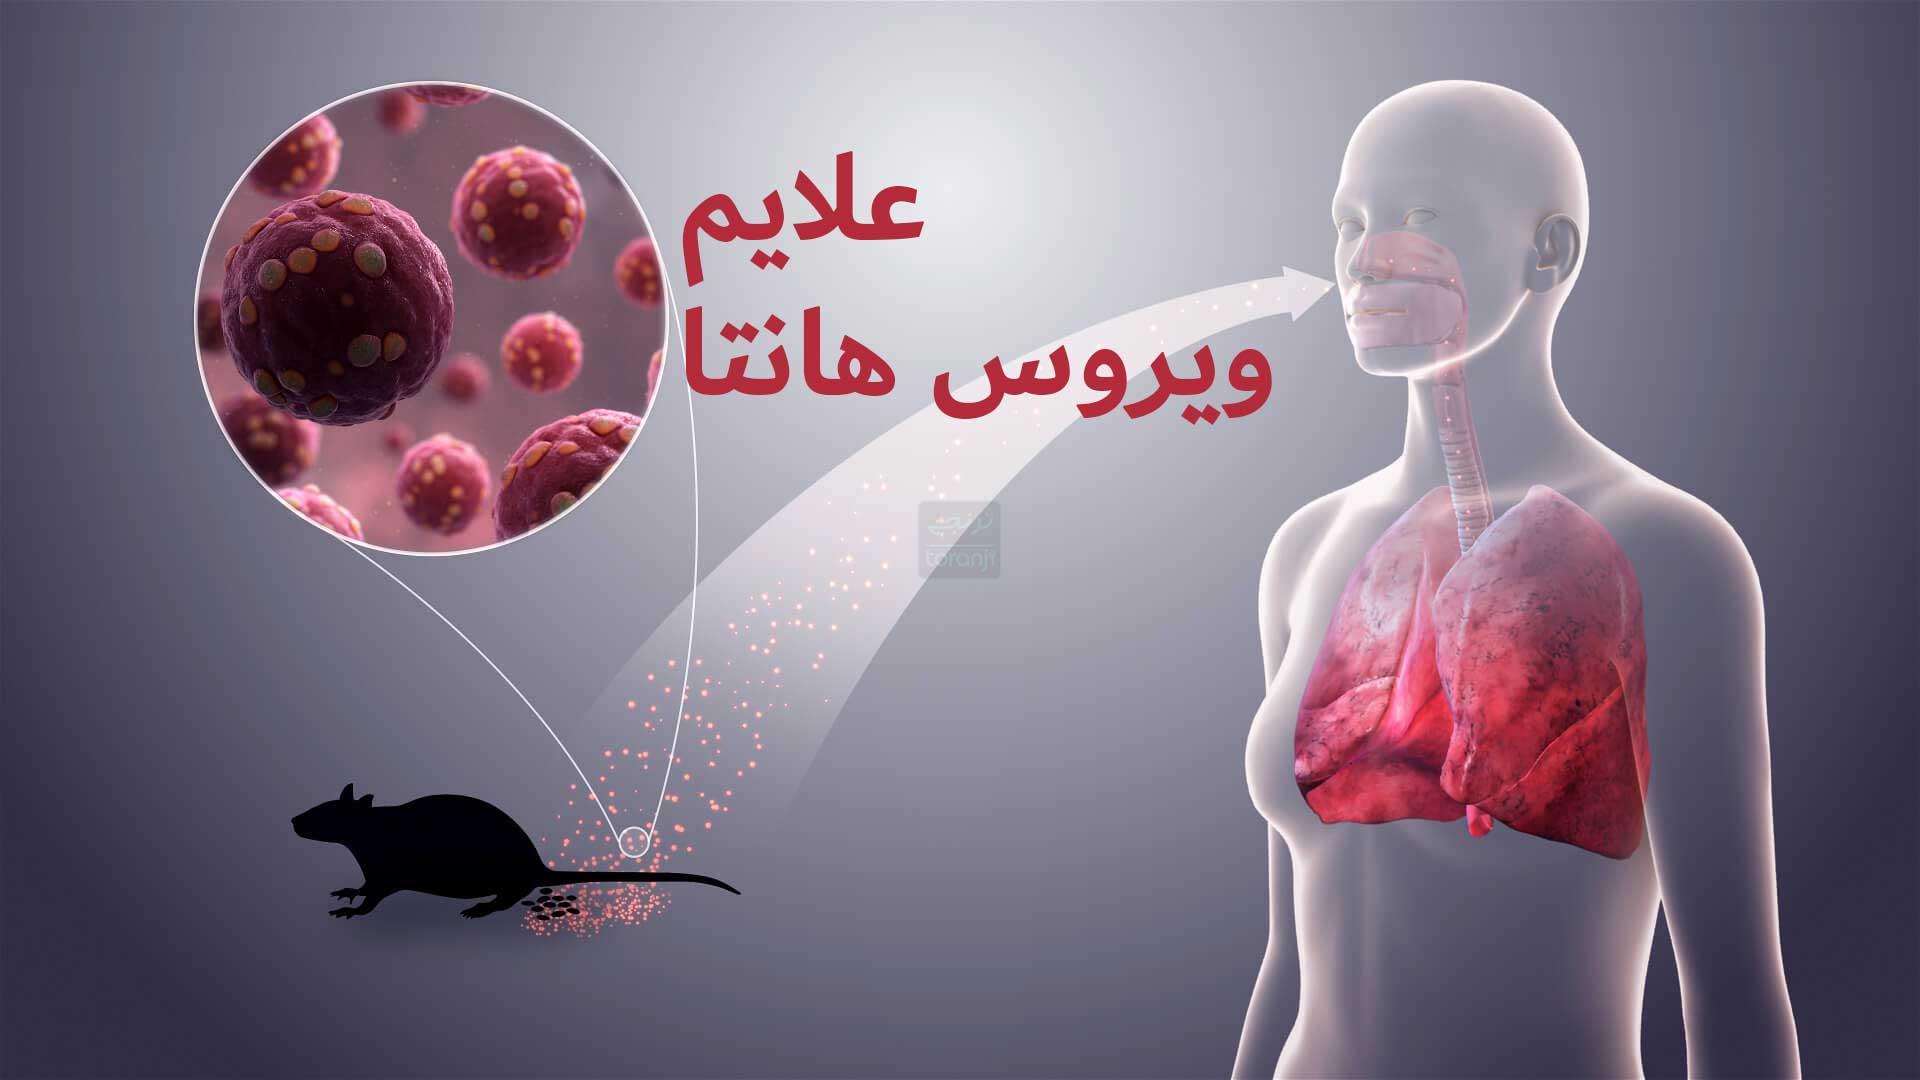 علائم ویروس هانتا